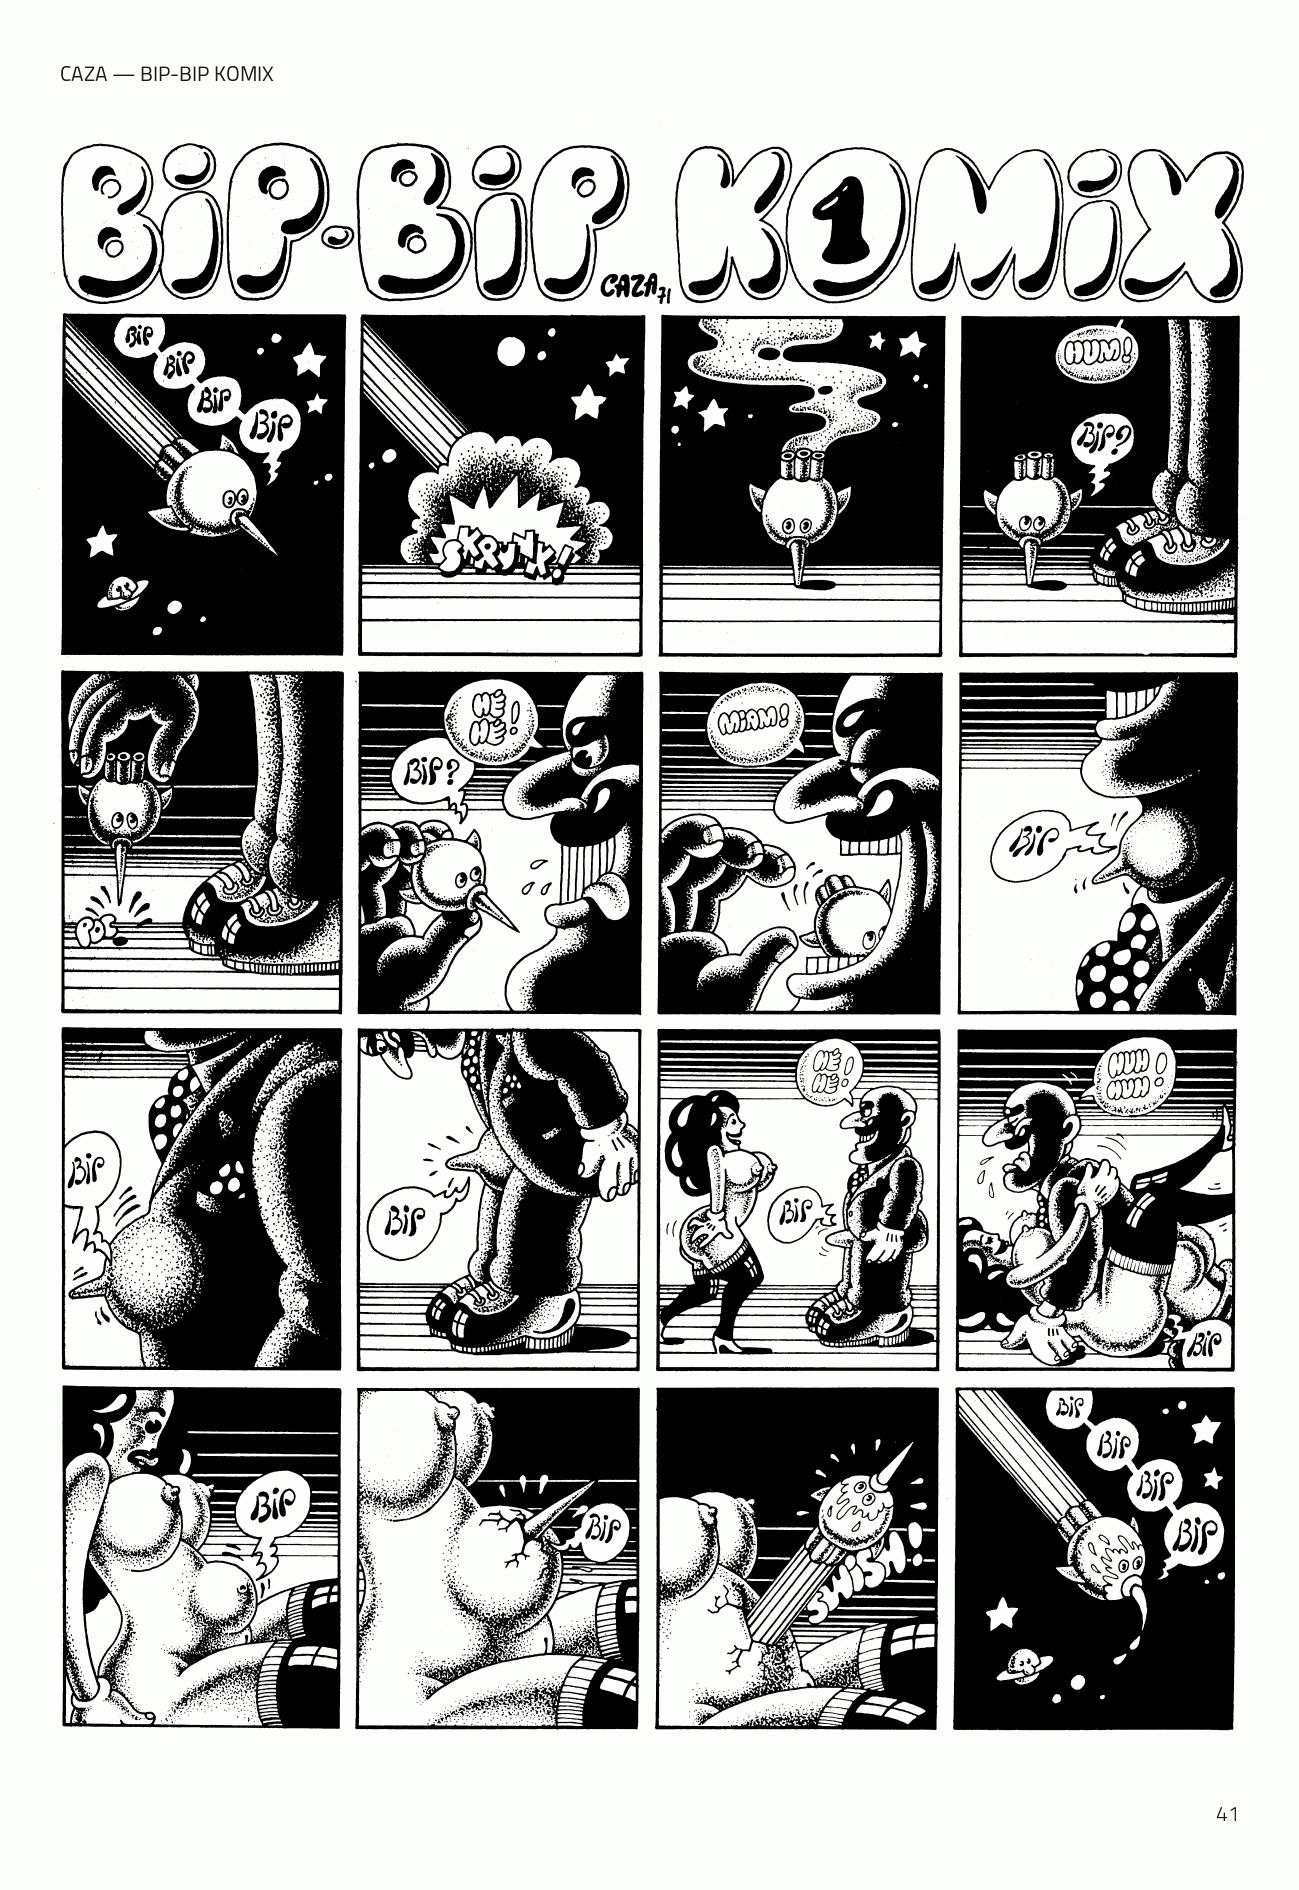 Caza – Bip bip Komix